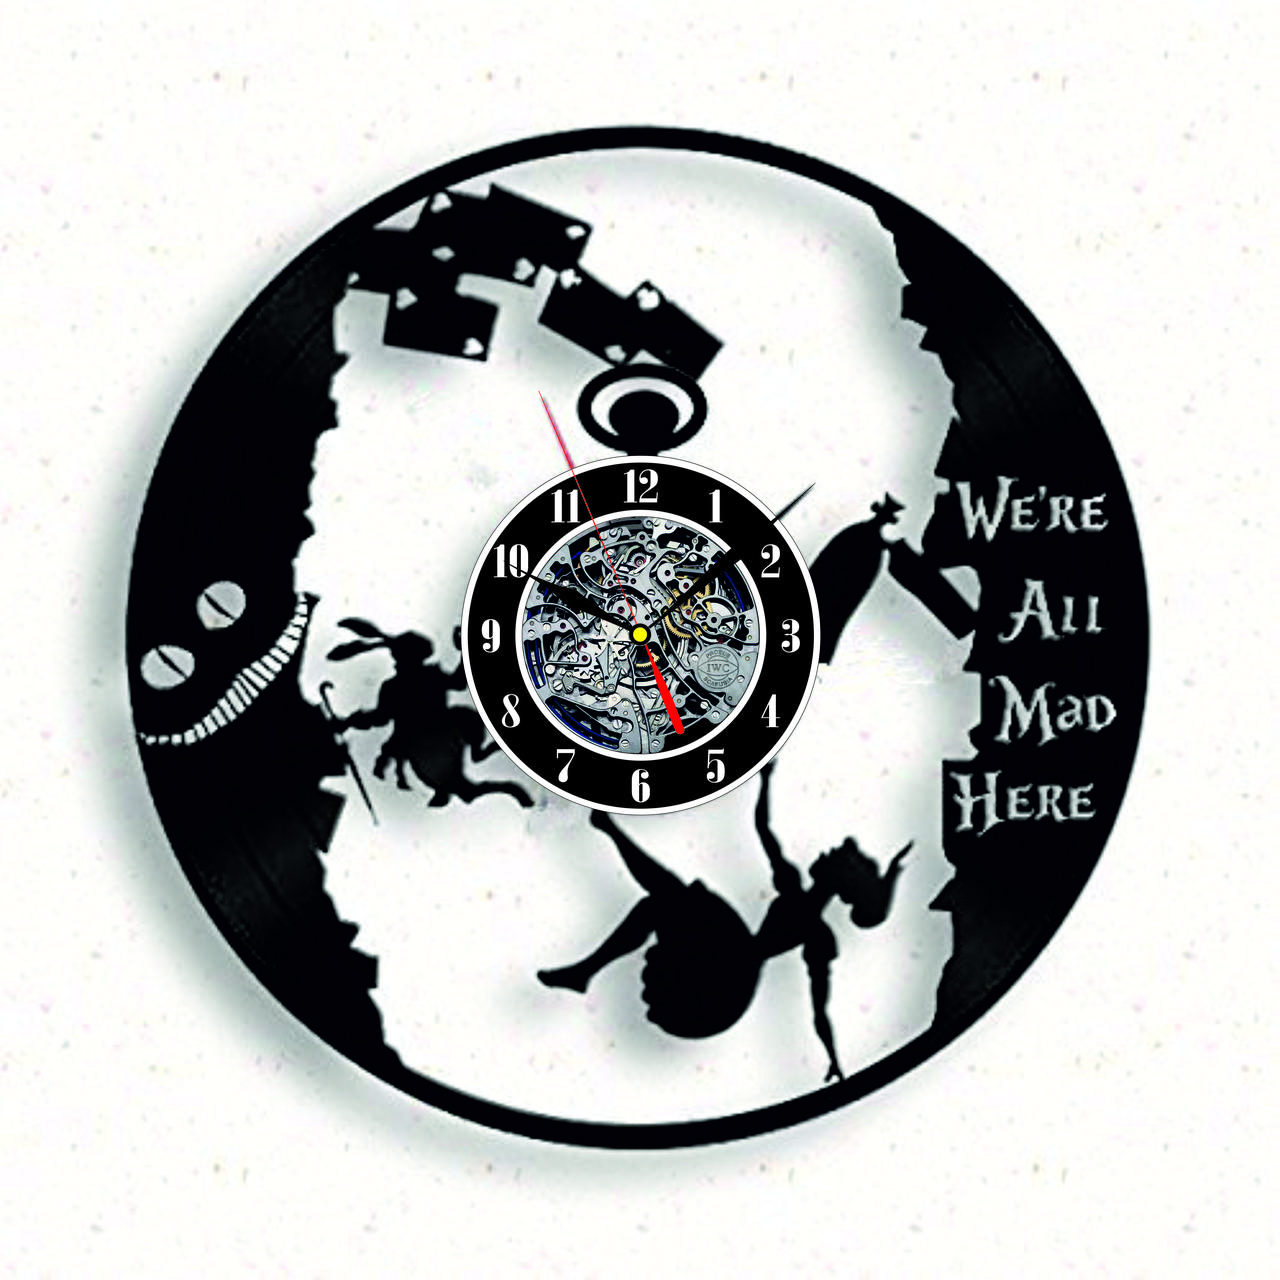 Настенные часы из виниловых пластинок LikeMark Alice in Wonderland